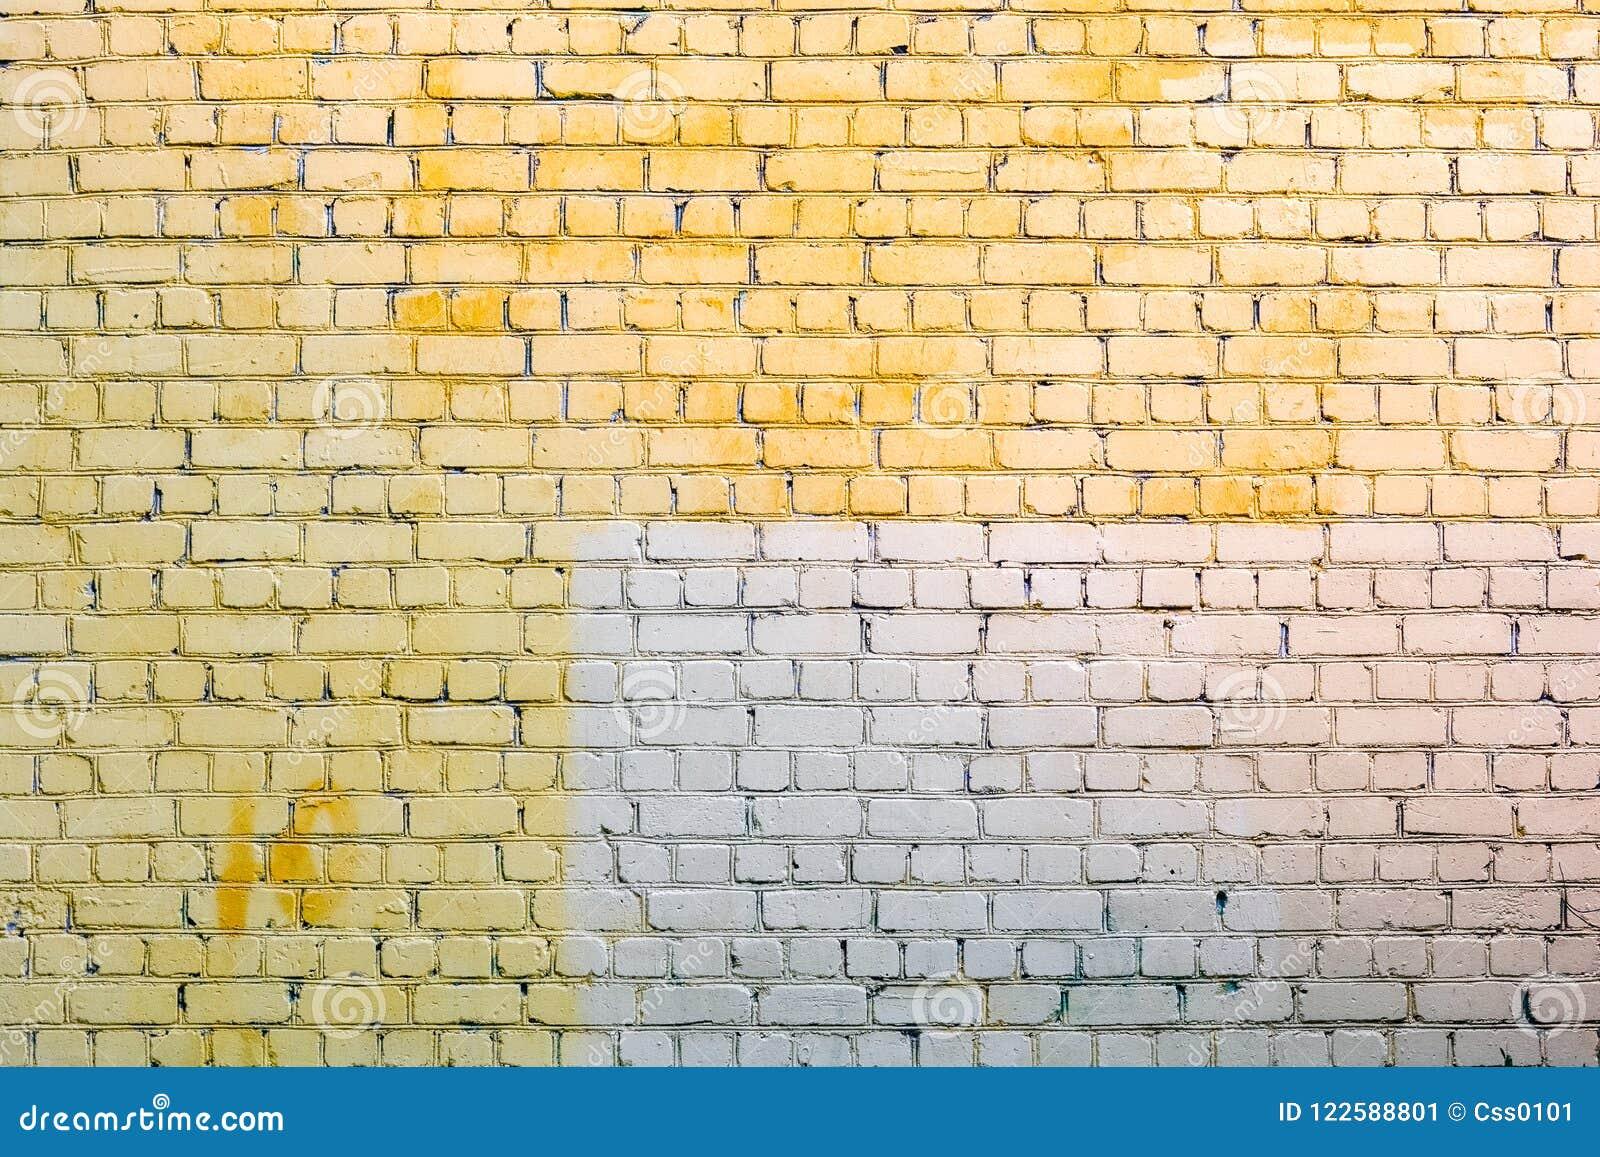 Yellow And Gray Stone Bricks Wall Stock Image - Image of block, gray ...